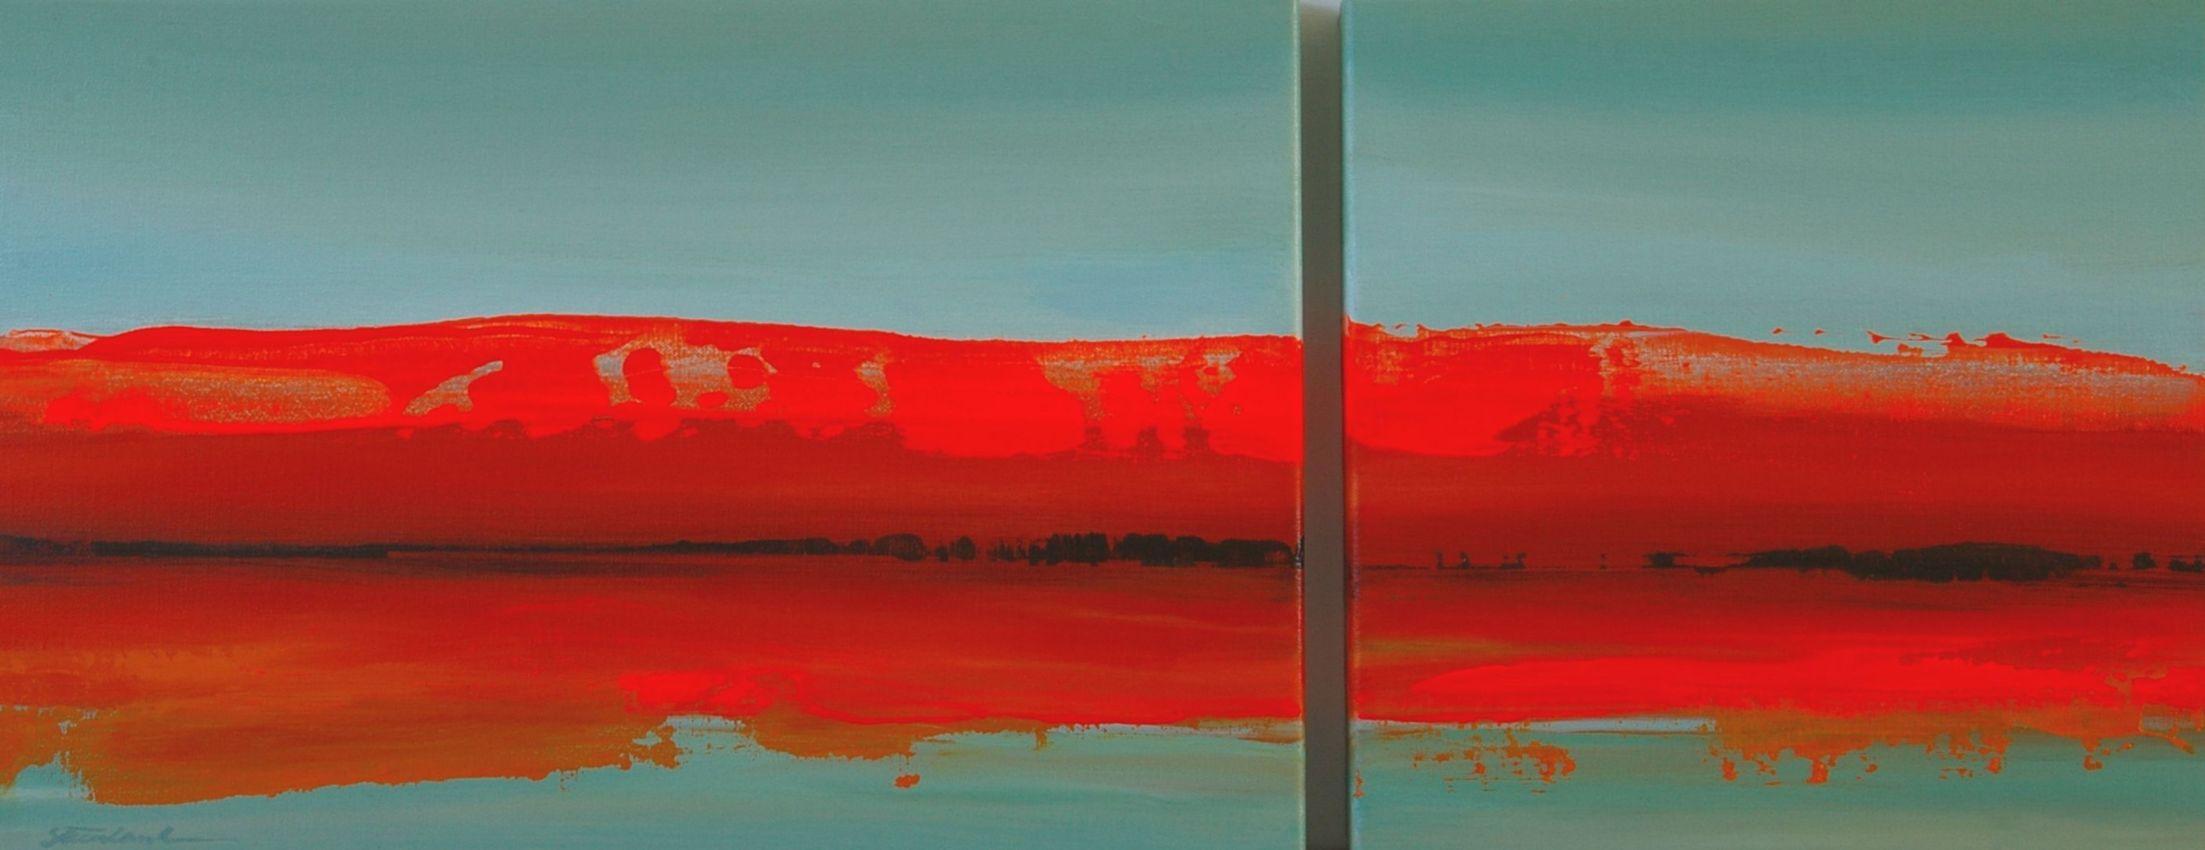 Orange Lake. 28x72cm